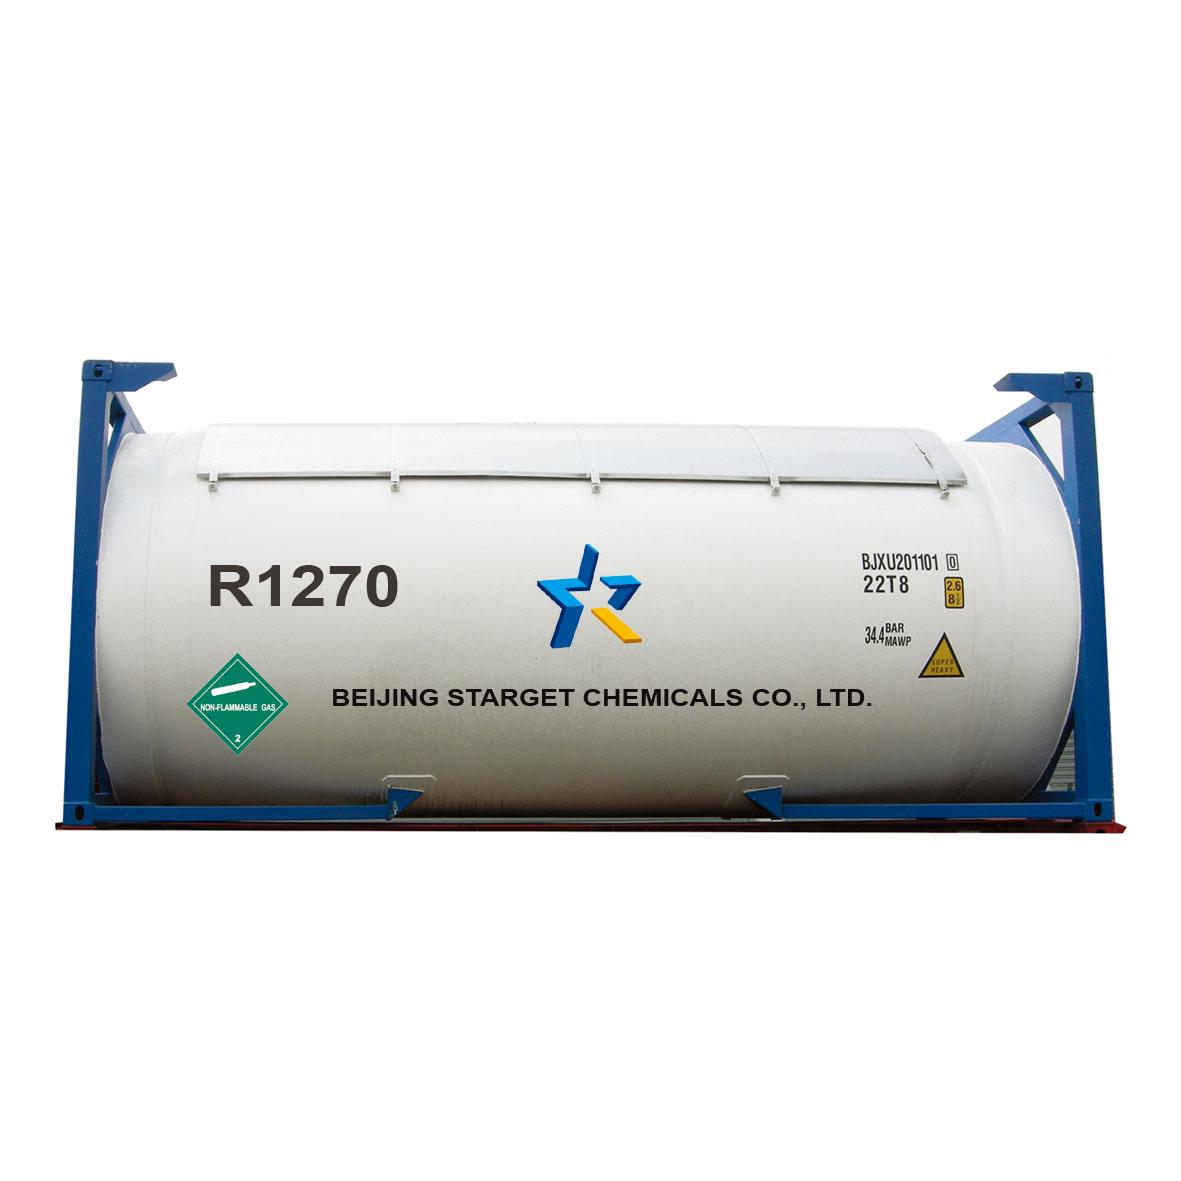 Refrigerant R1270